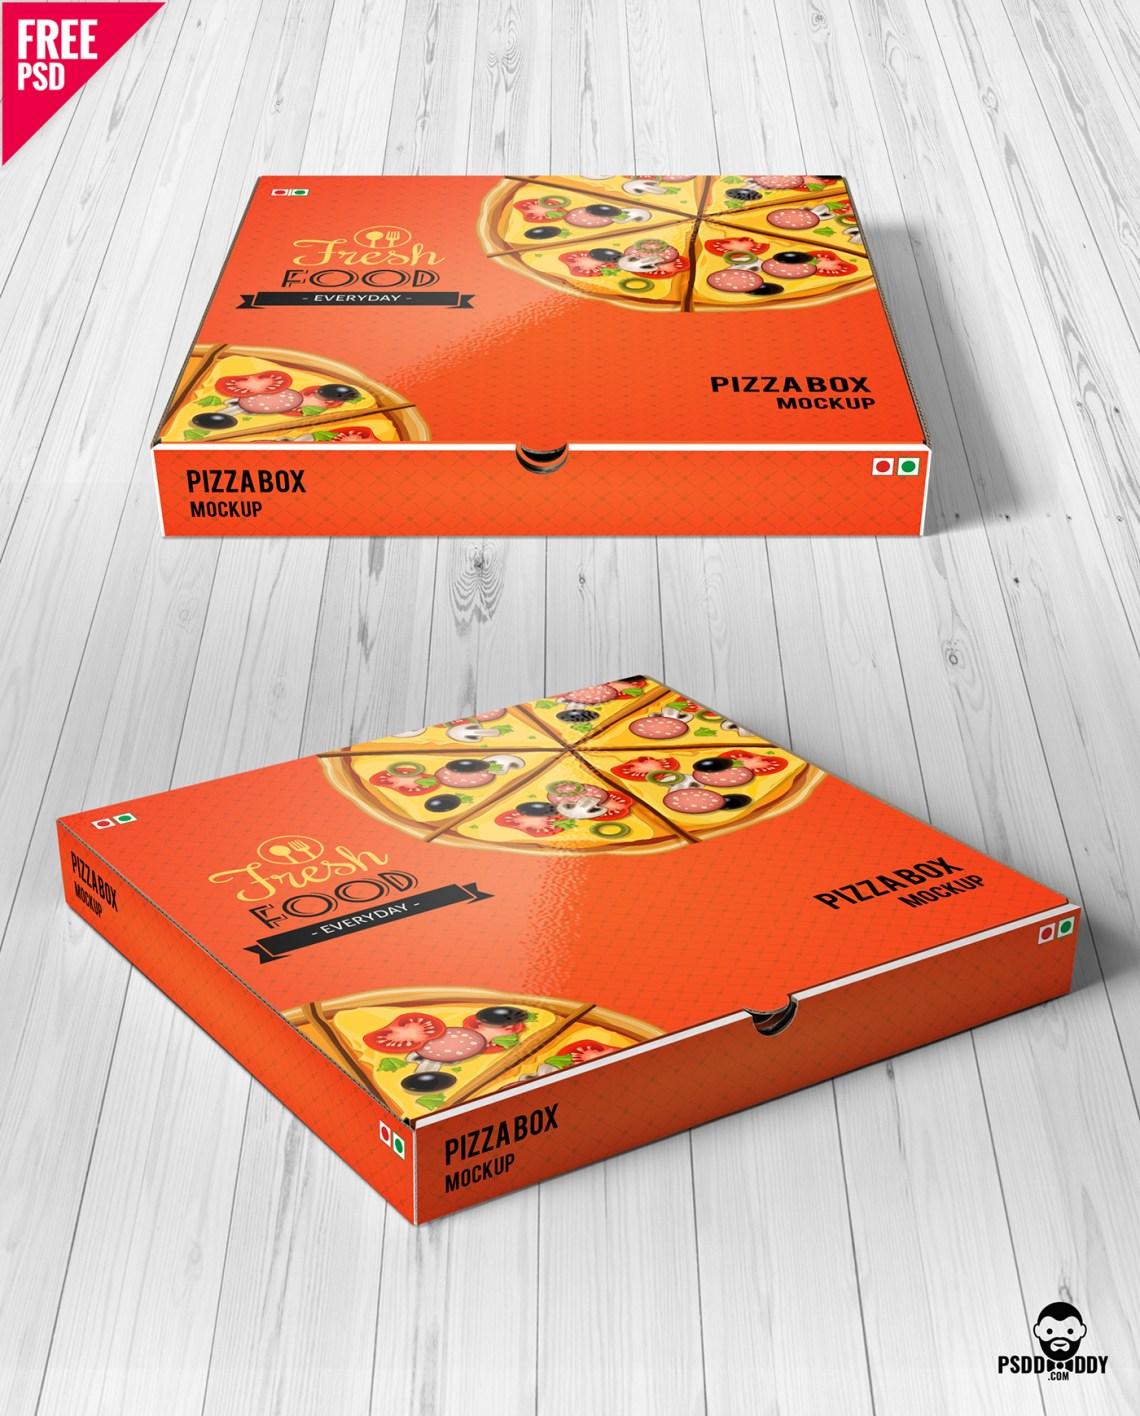 Download Pizza Box Mockup Free PSD on Behance